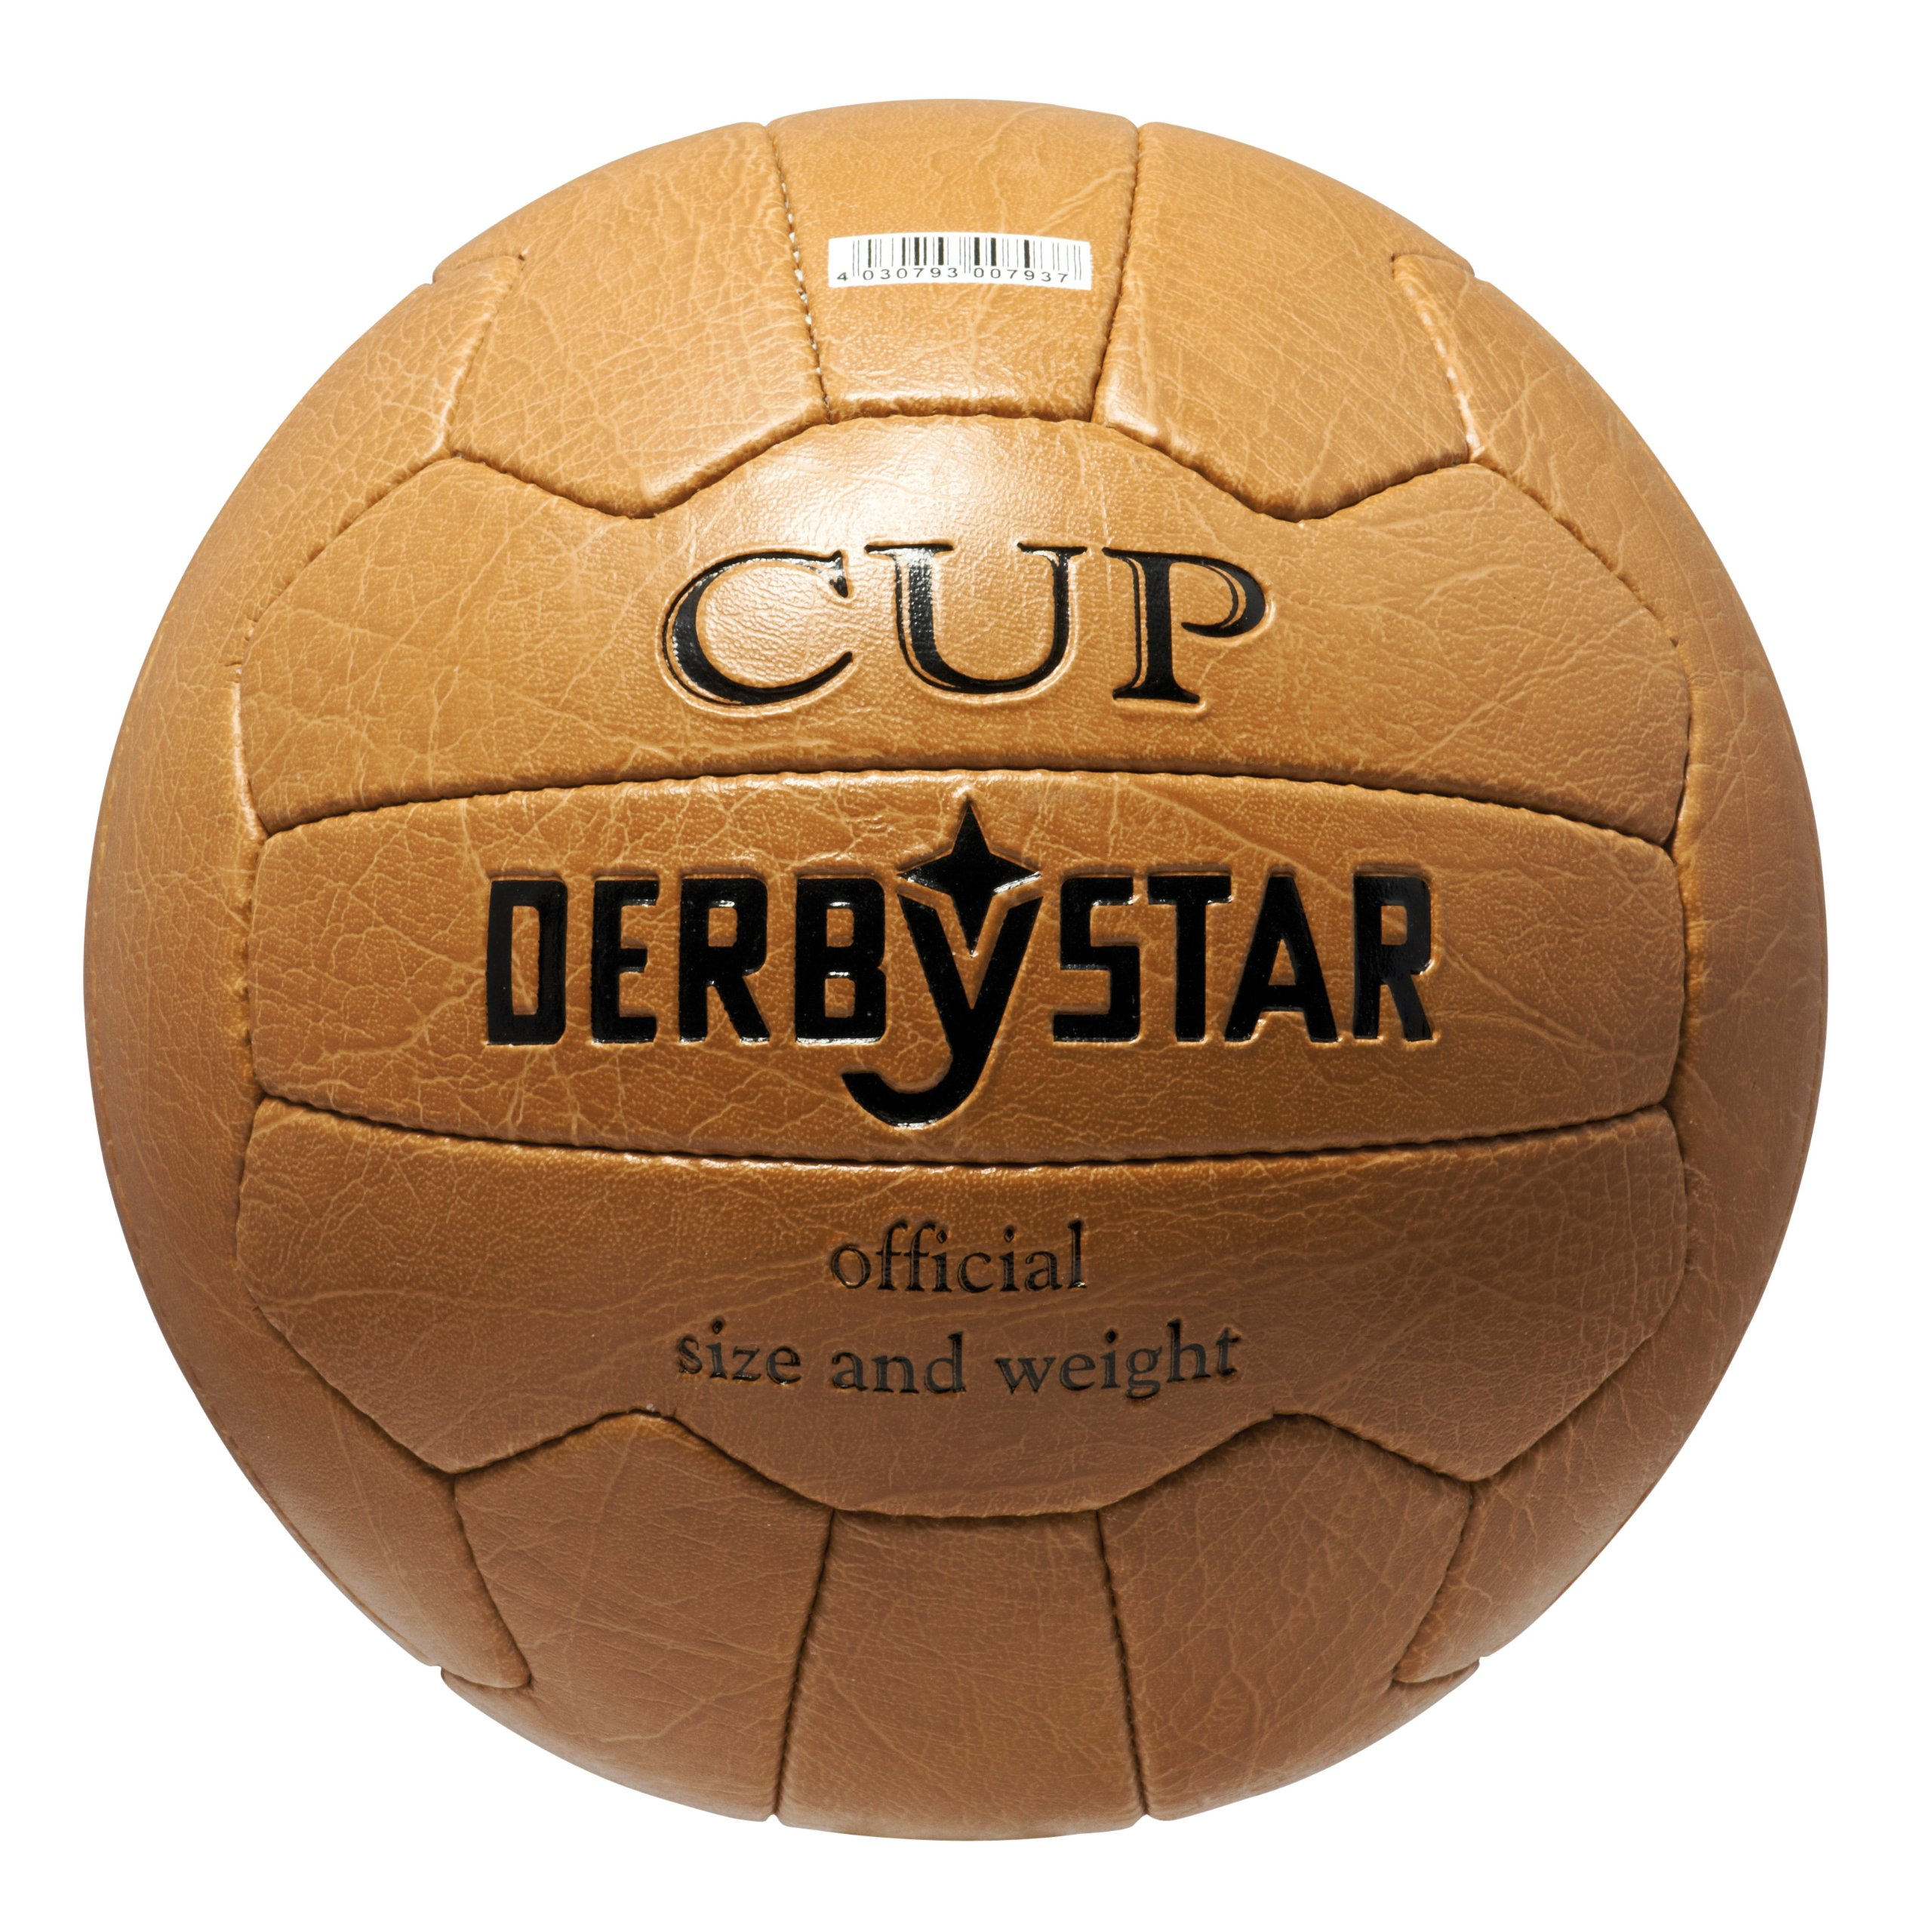 DERBYSTAR, Pallone da calcio, Marrone (braun), Misura 5